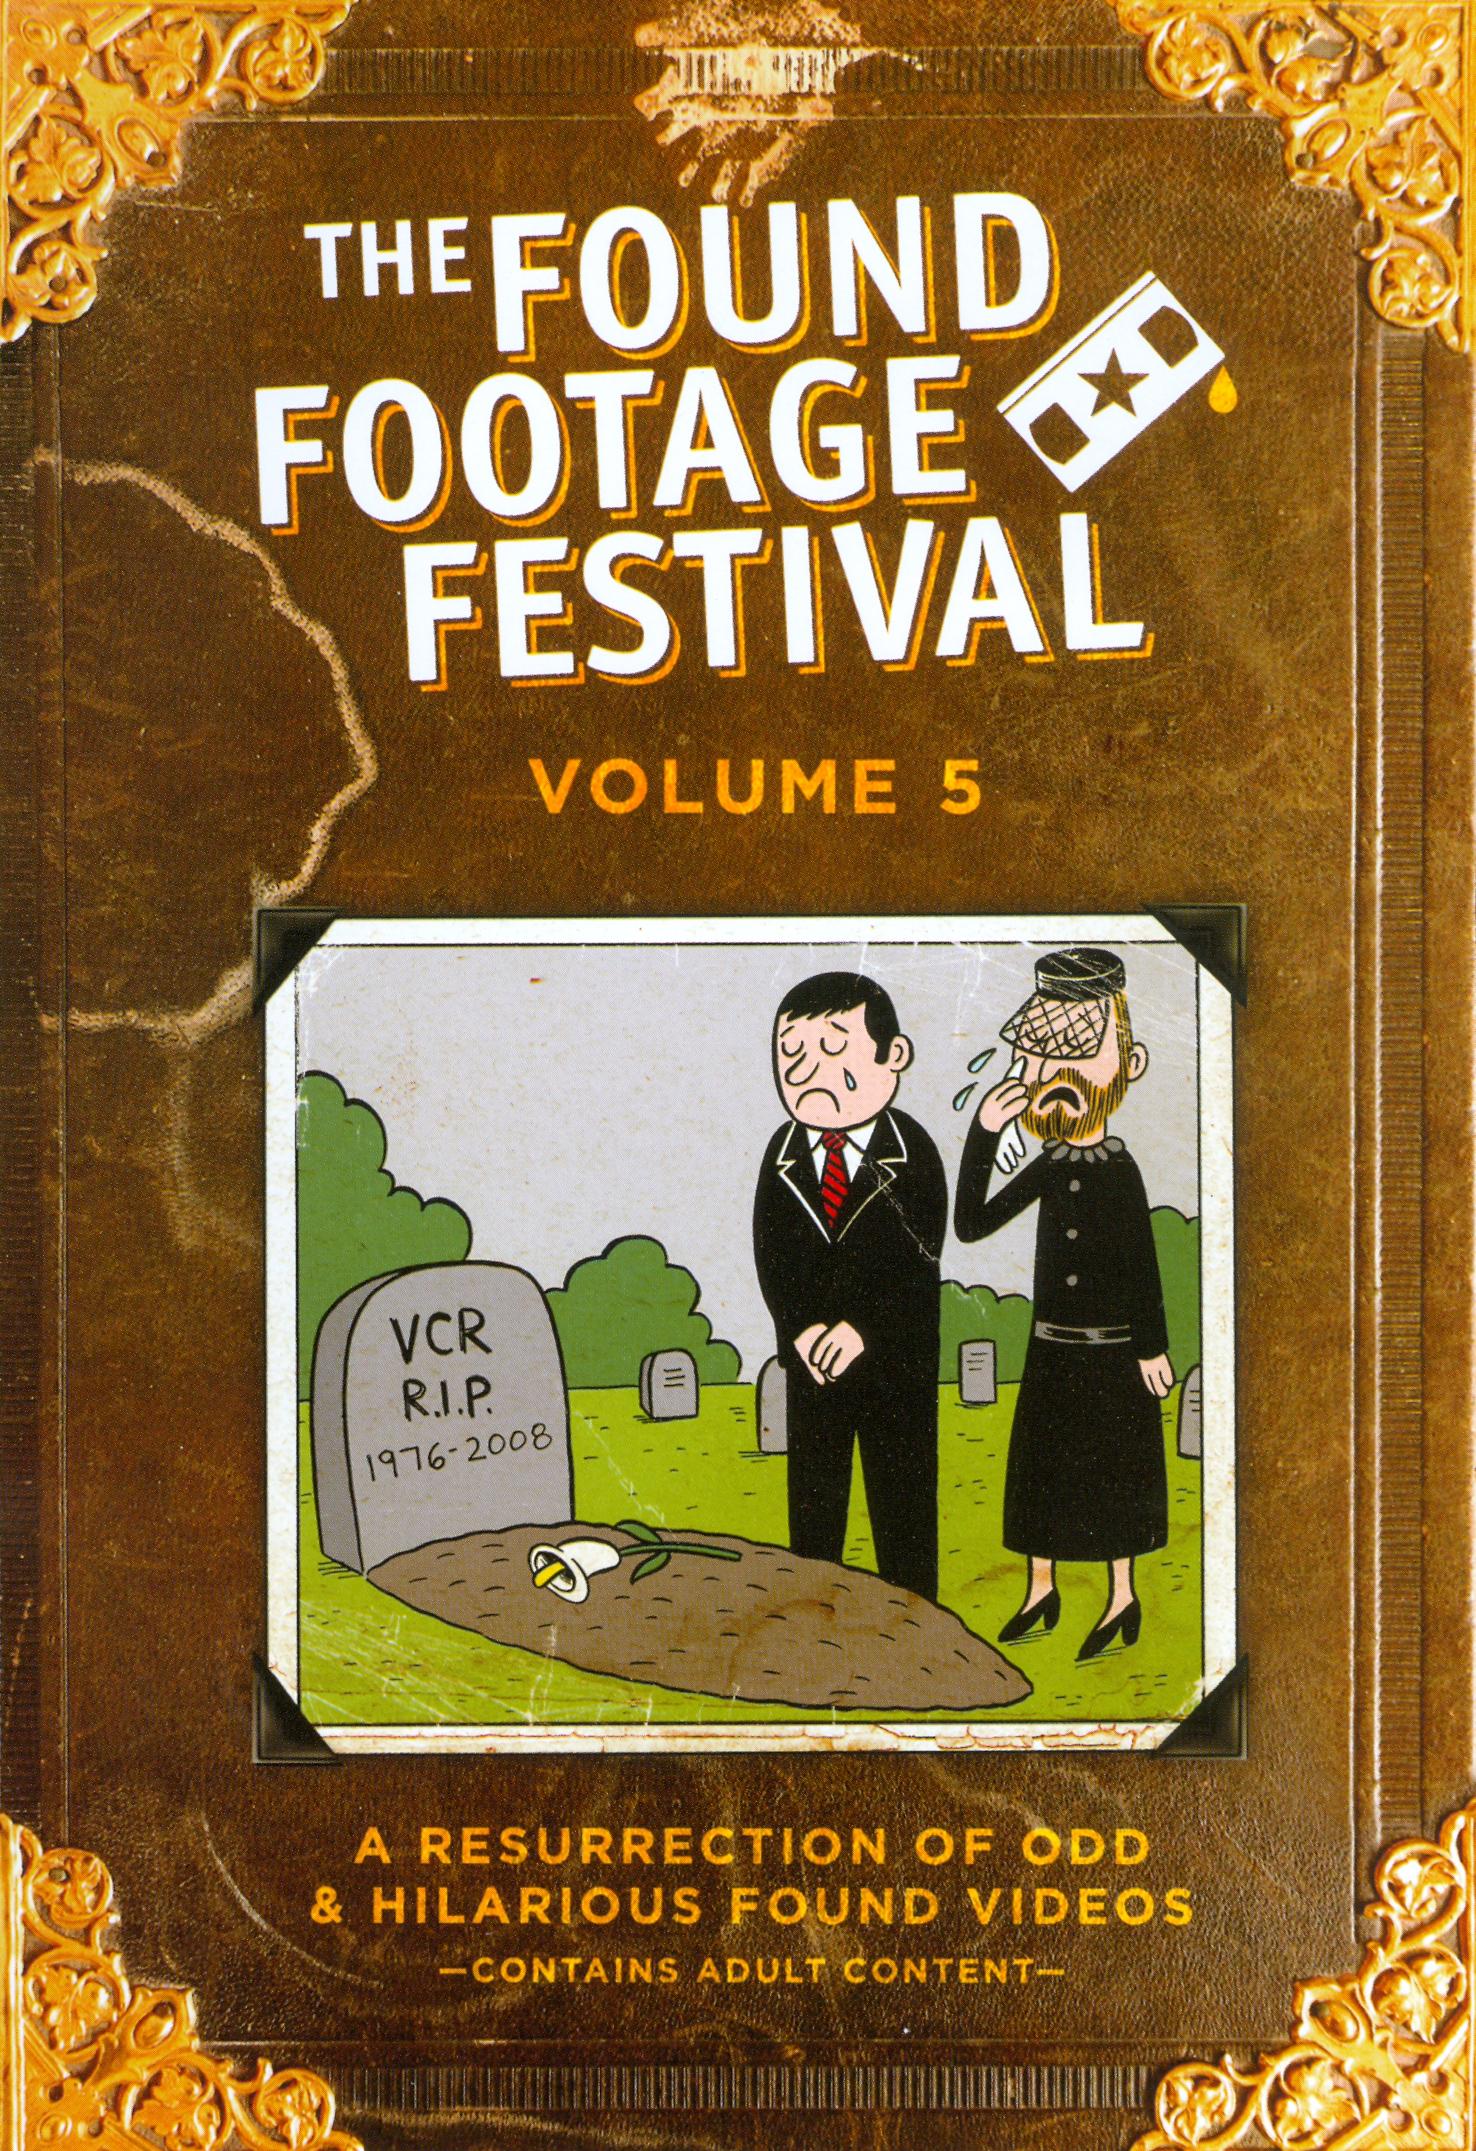 The Found Footage Festival, Vol. 5